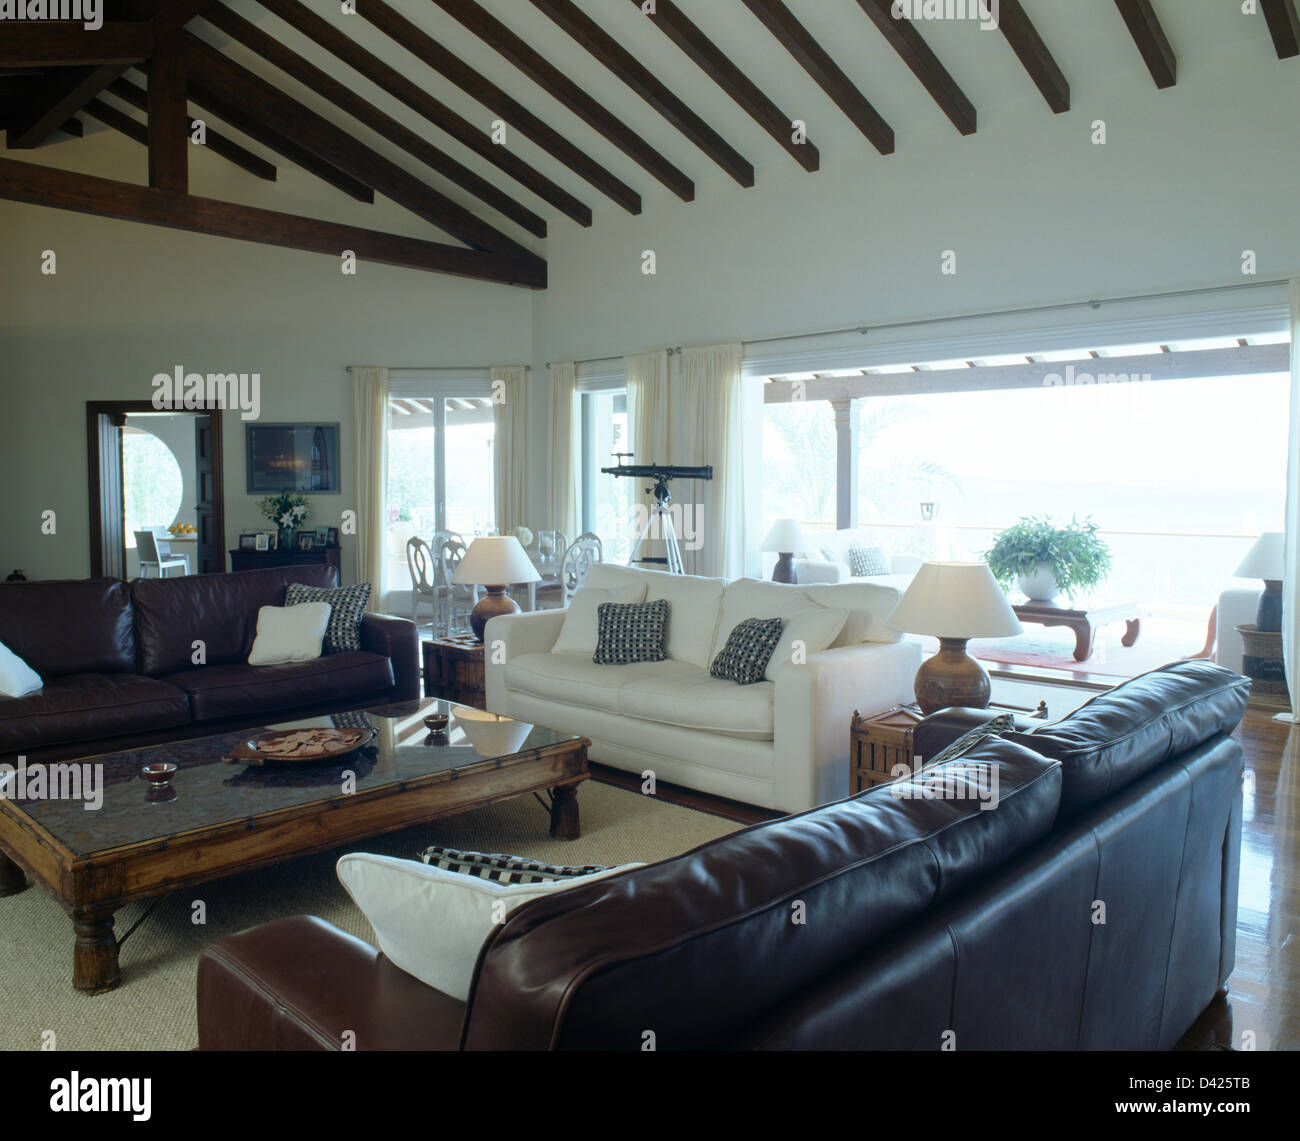 leather sofas settees stockfotos leather sofas settees. Black Bedroom Furniture Sets. Home Design Ideas